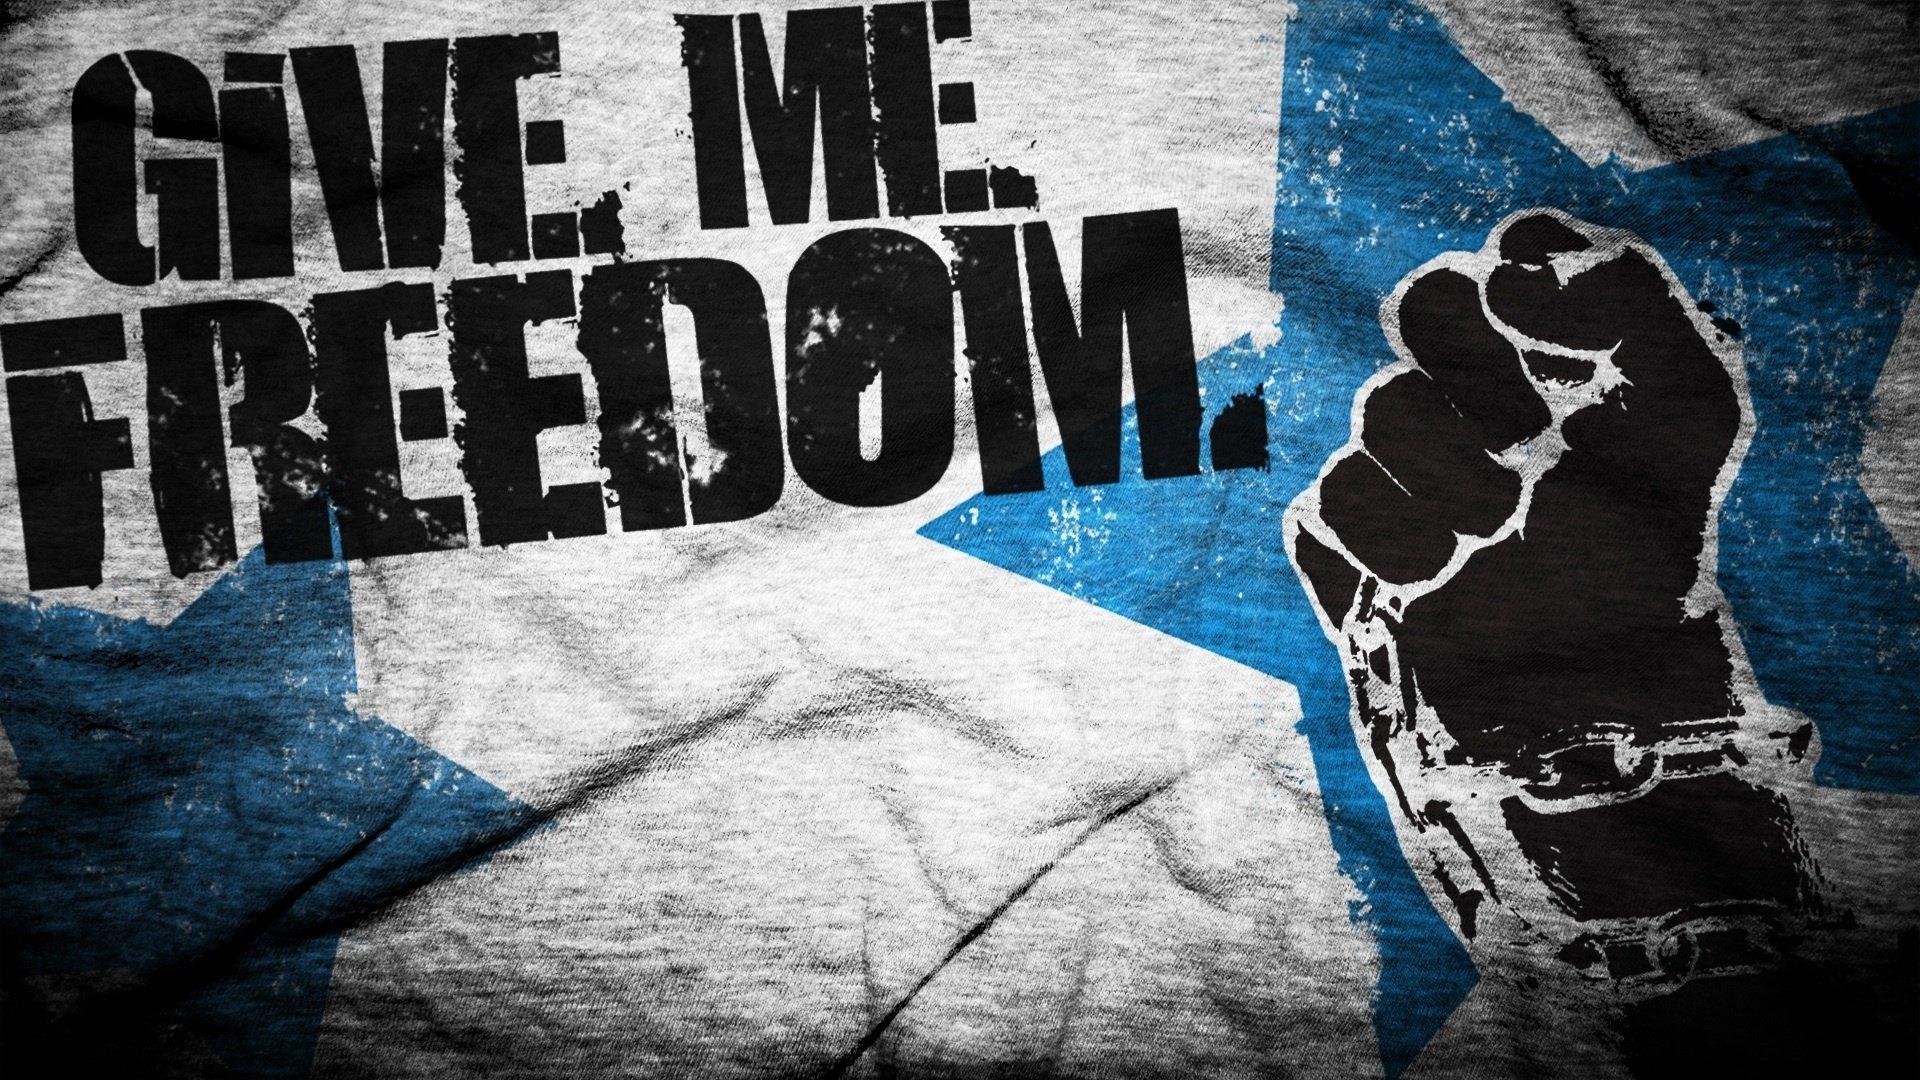 Give me freedom 1080p hd wallpaper 1080p hd wallpapers ImgStockscom 1920x1080